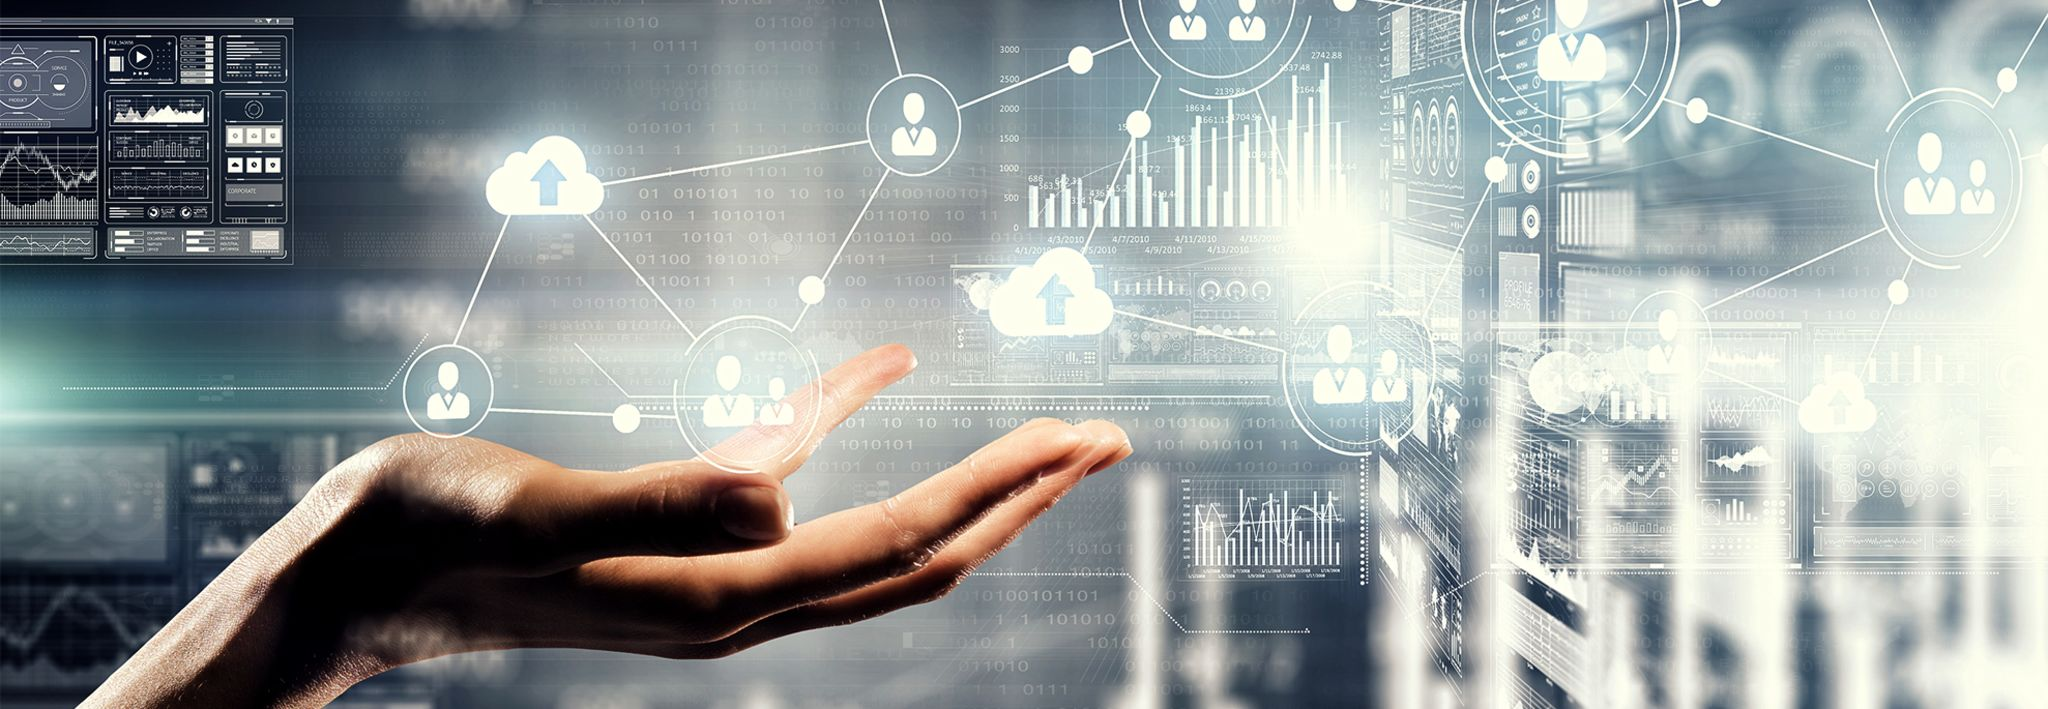 Associate Degree in Human Resource Management | CCU Online